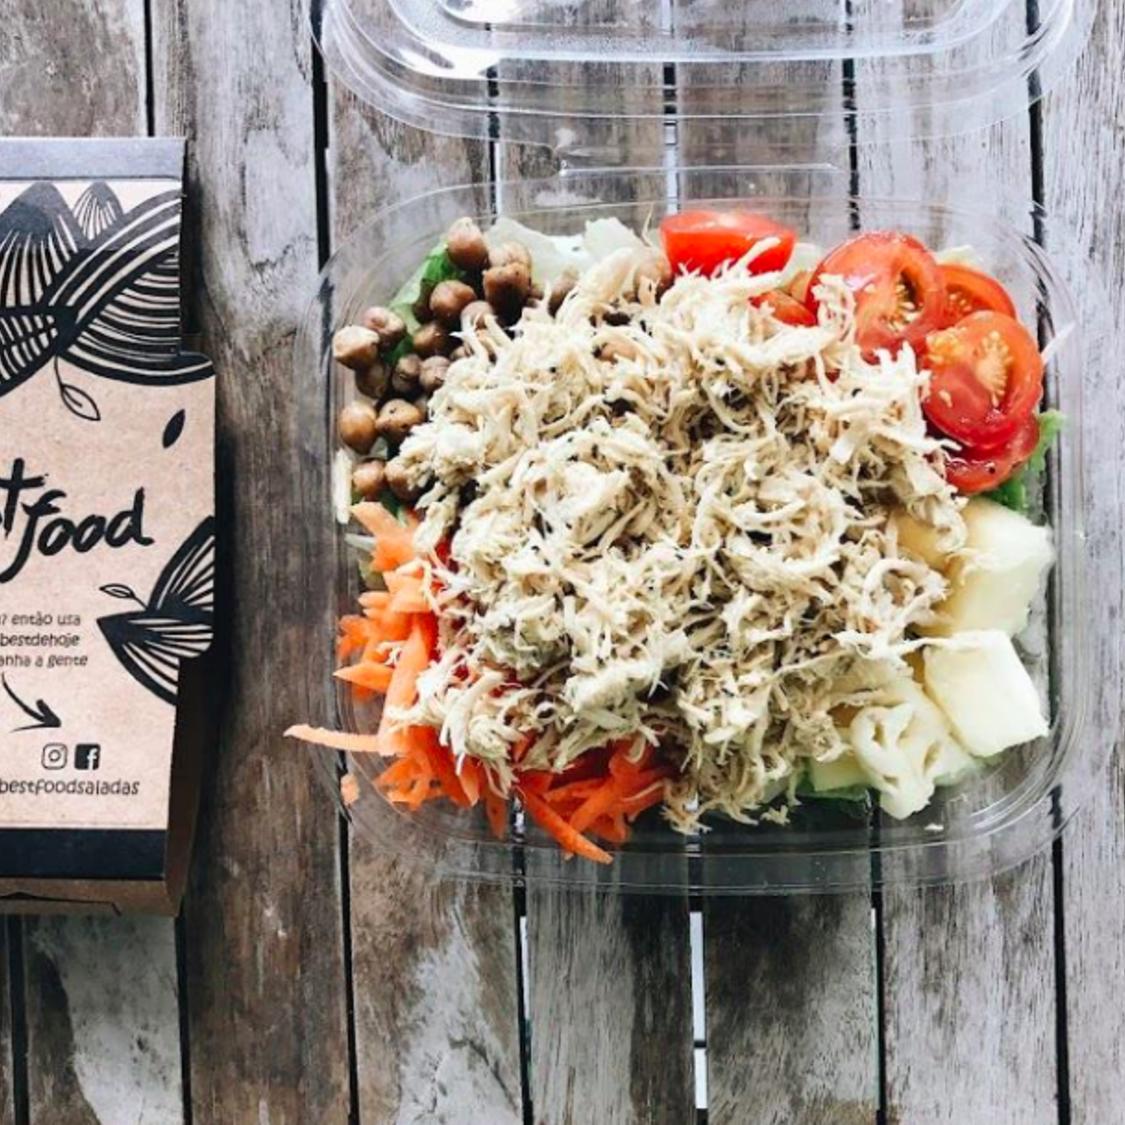 Best Food Saladas - Delivery